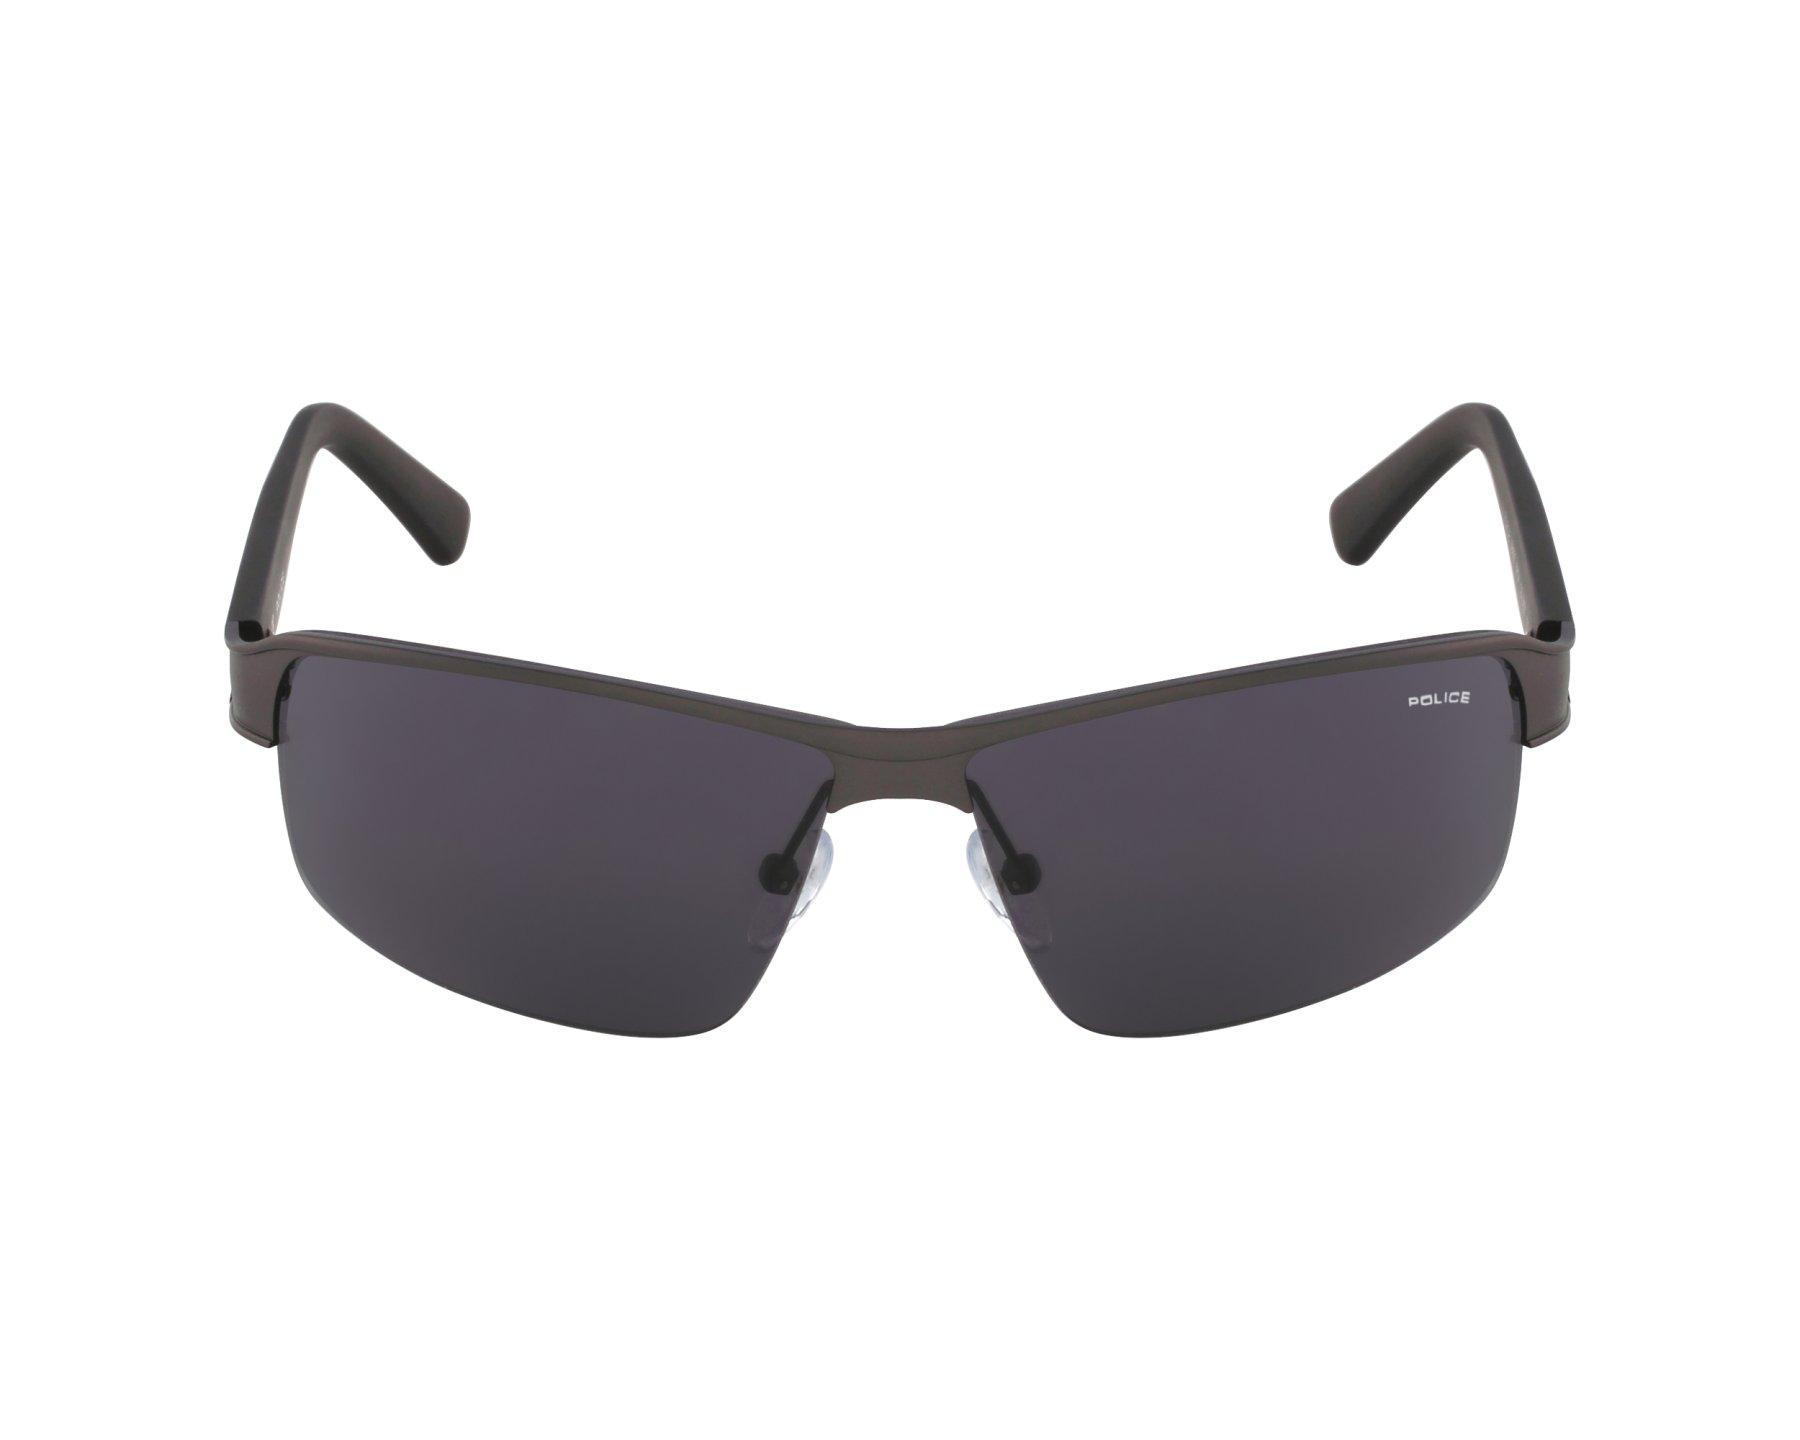 31593123014 Sunglasses Police S-8855 0627 - Grey profile view